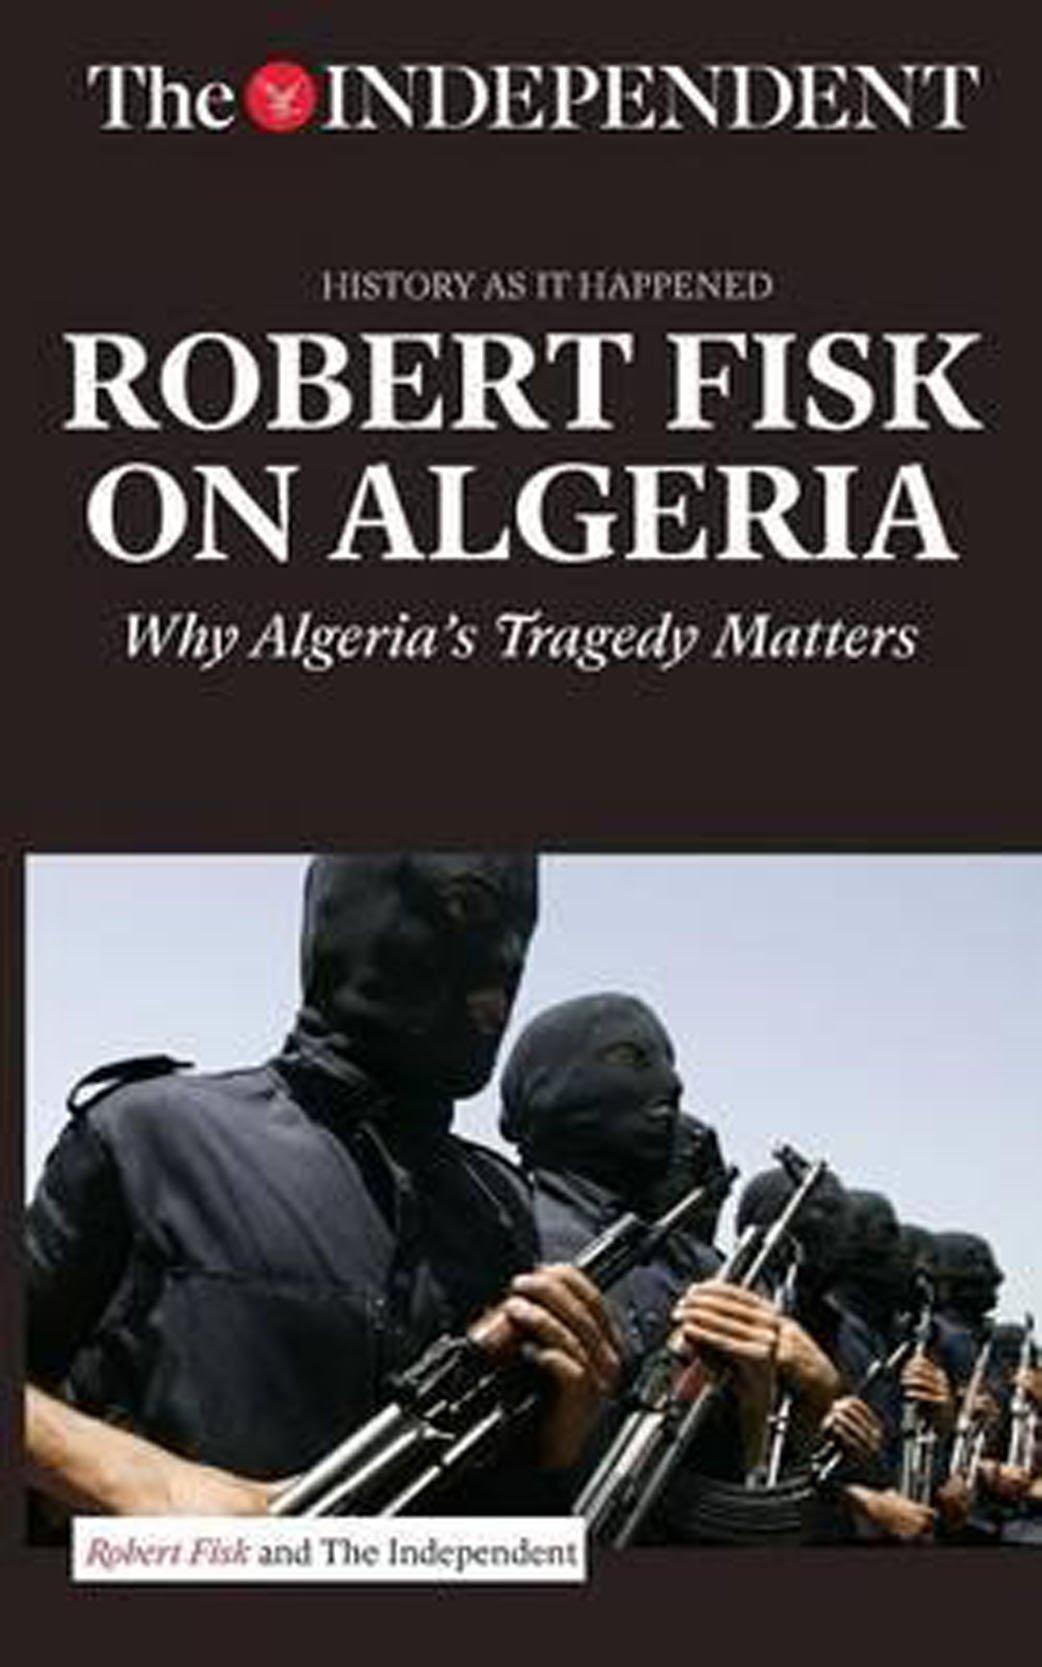 ROBERT FISK ON ALGERIA: Why Algeria's Tragedy Matters